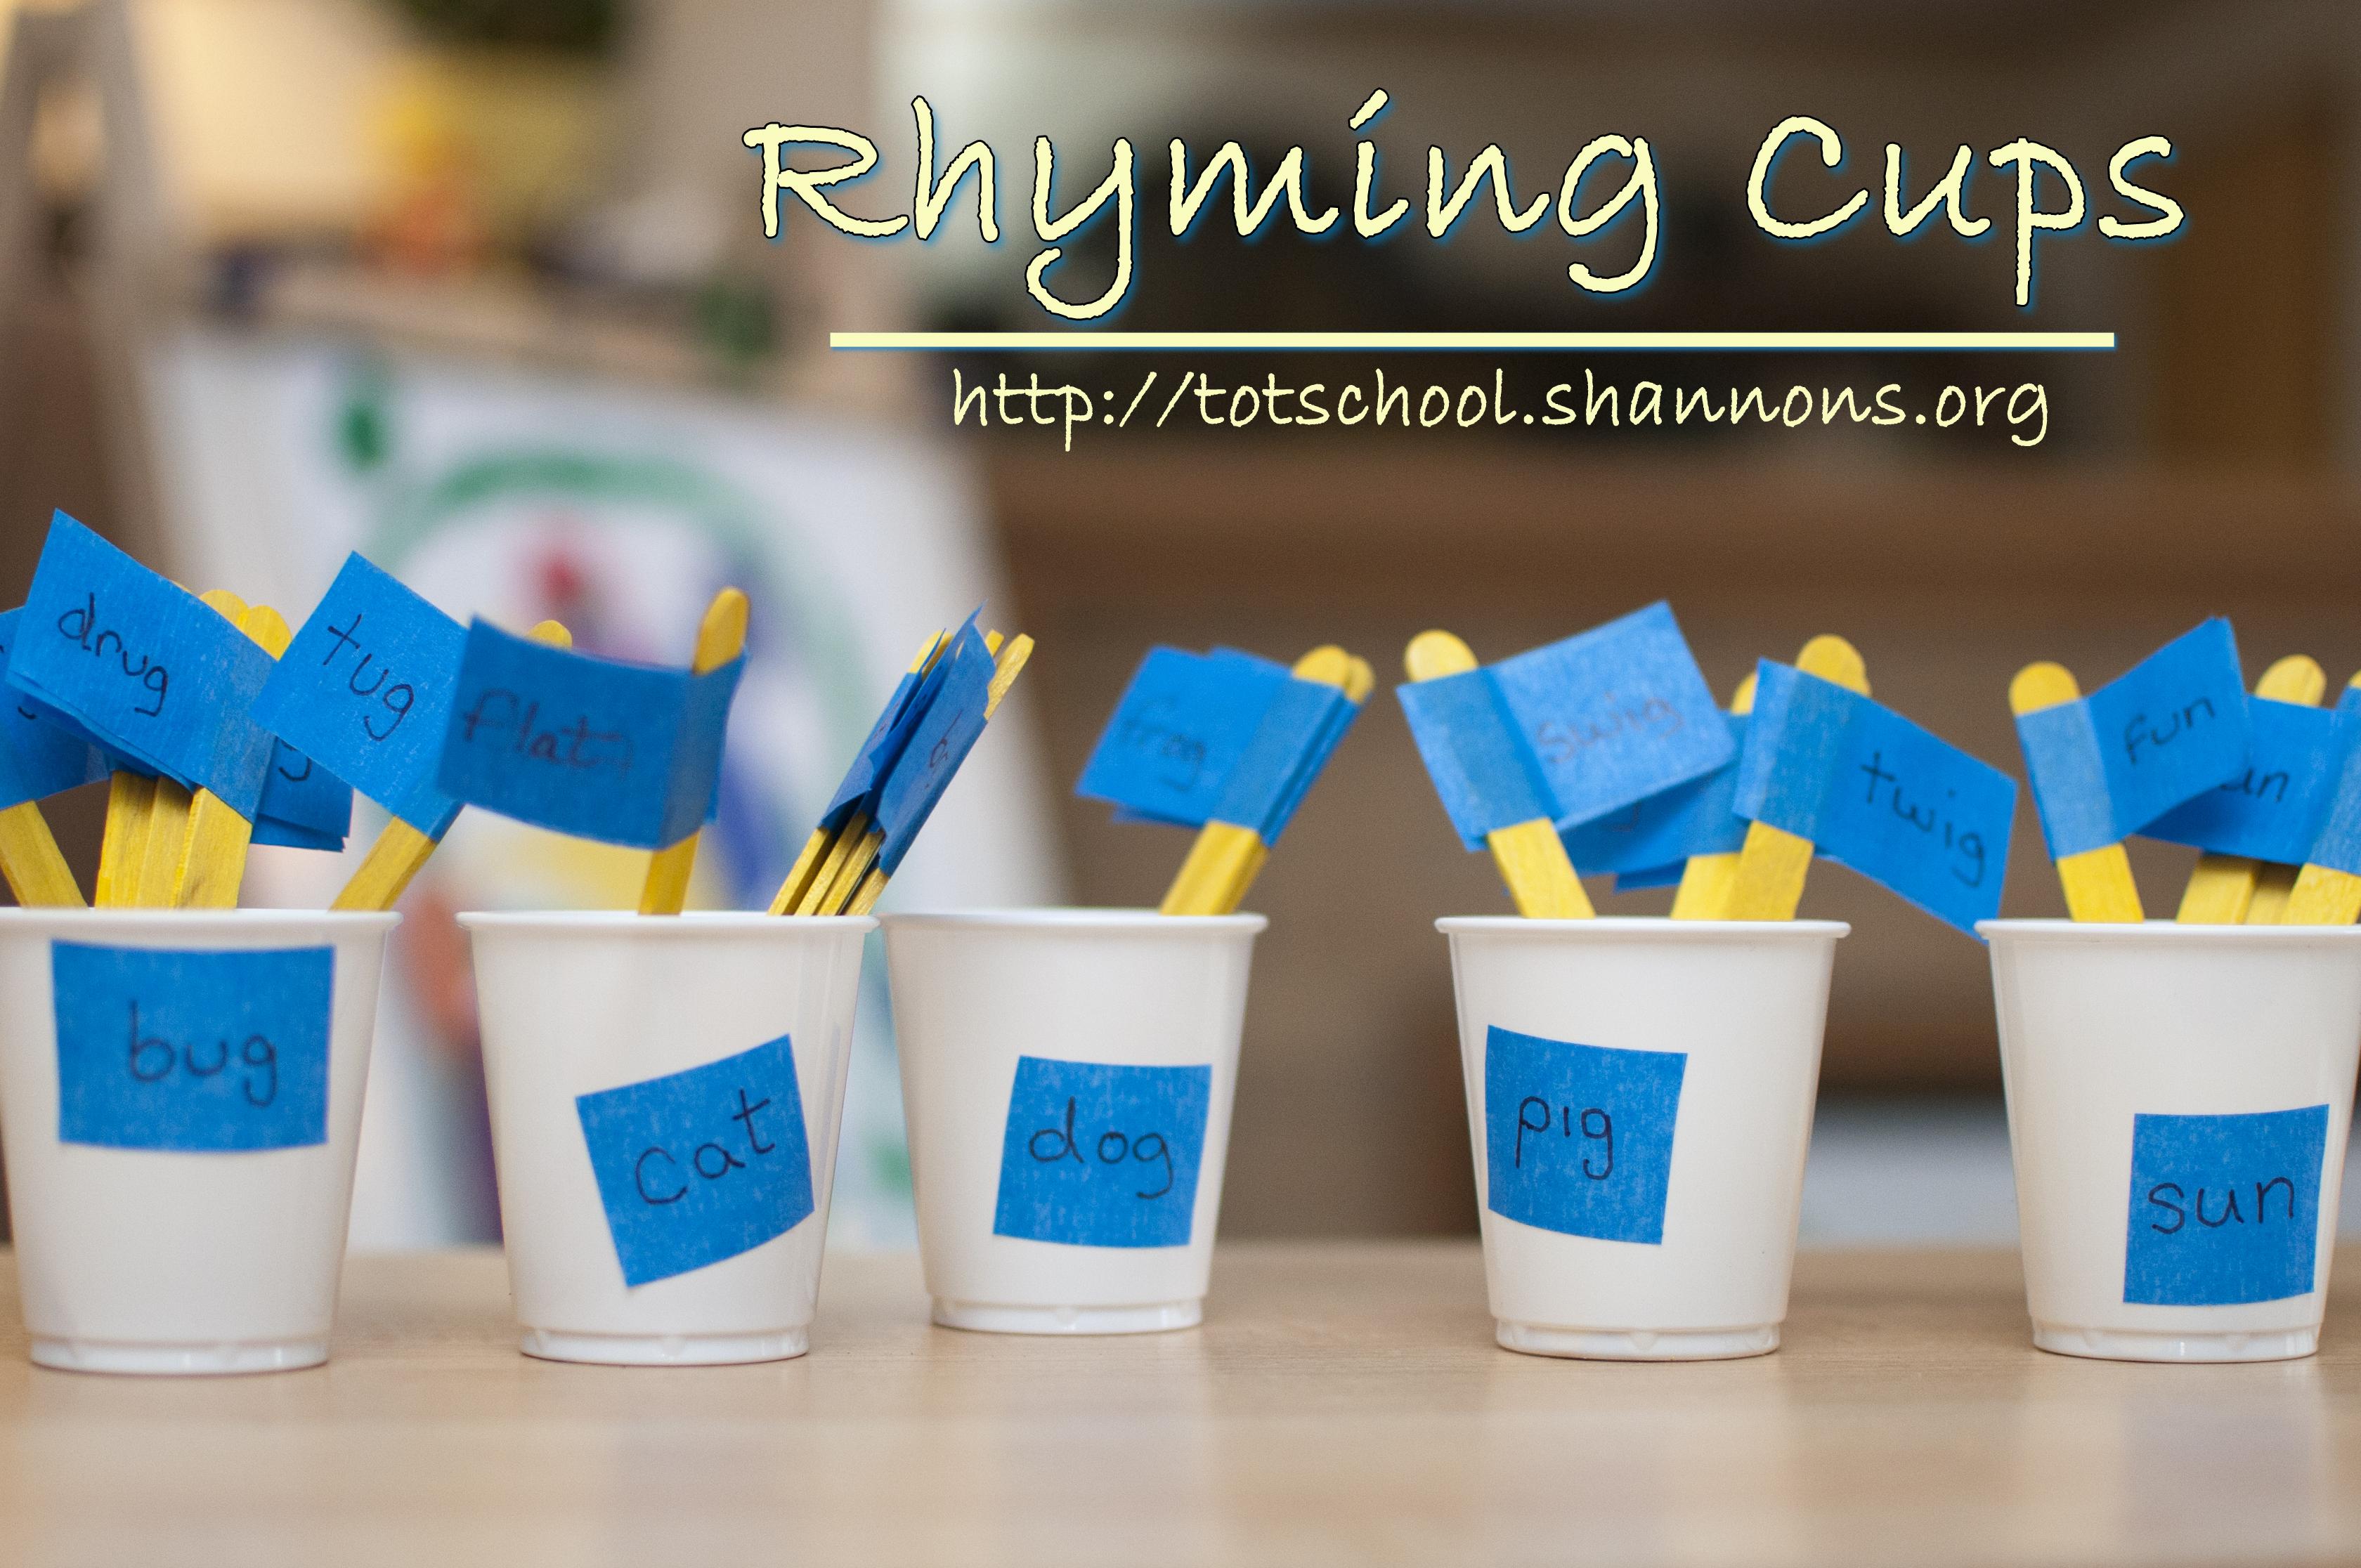 Worksheet Rhyming Words For Kindergarten to teach rhyming words kindergarten scalien how scalien